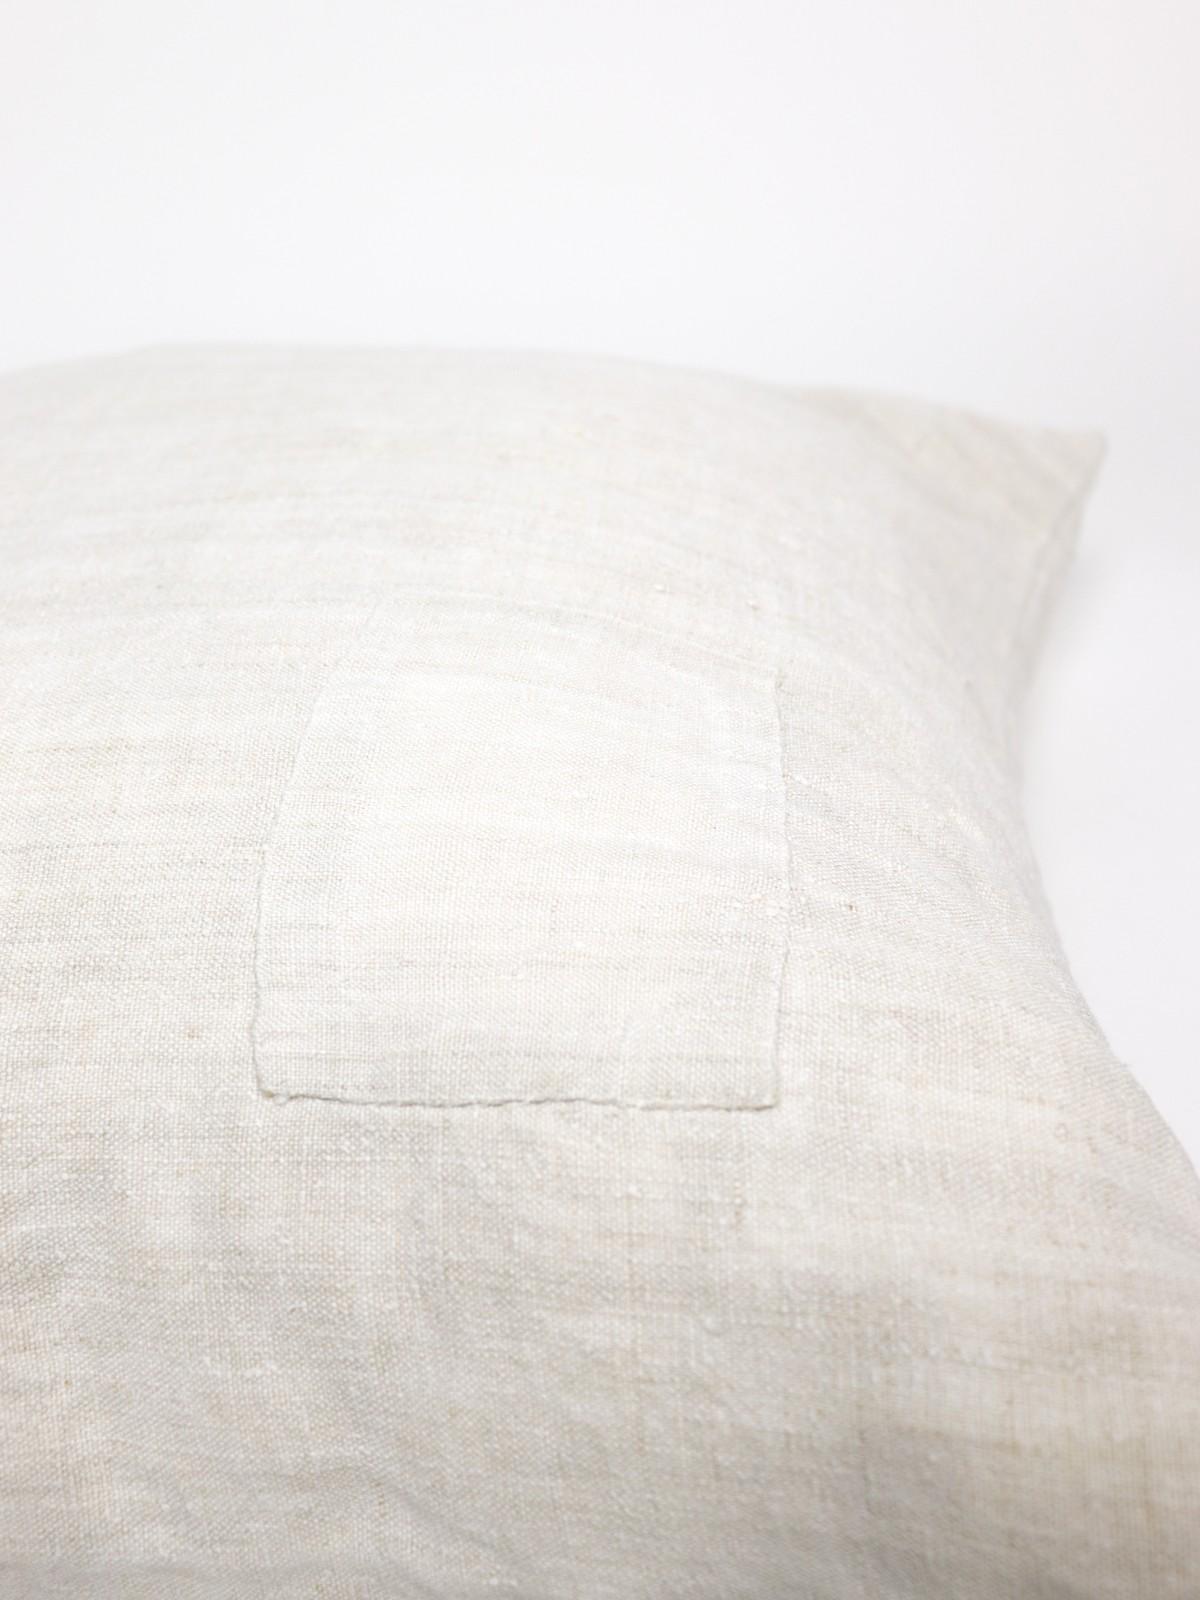 vintage white linen fabric cushion, brown.remake cushion, sheet fabric